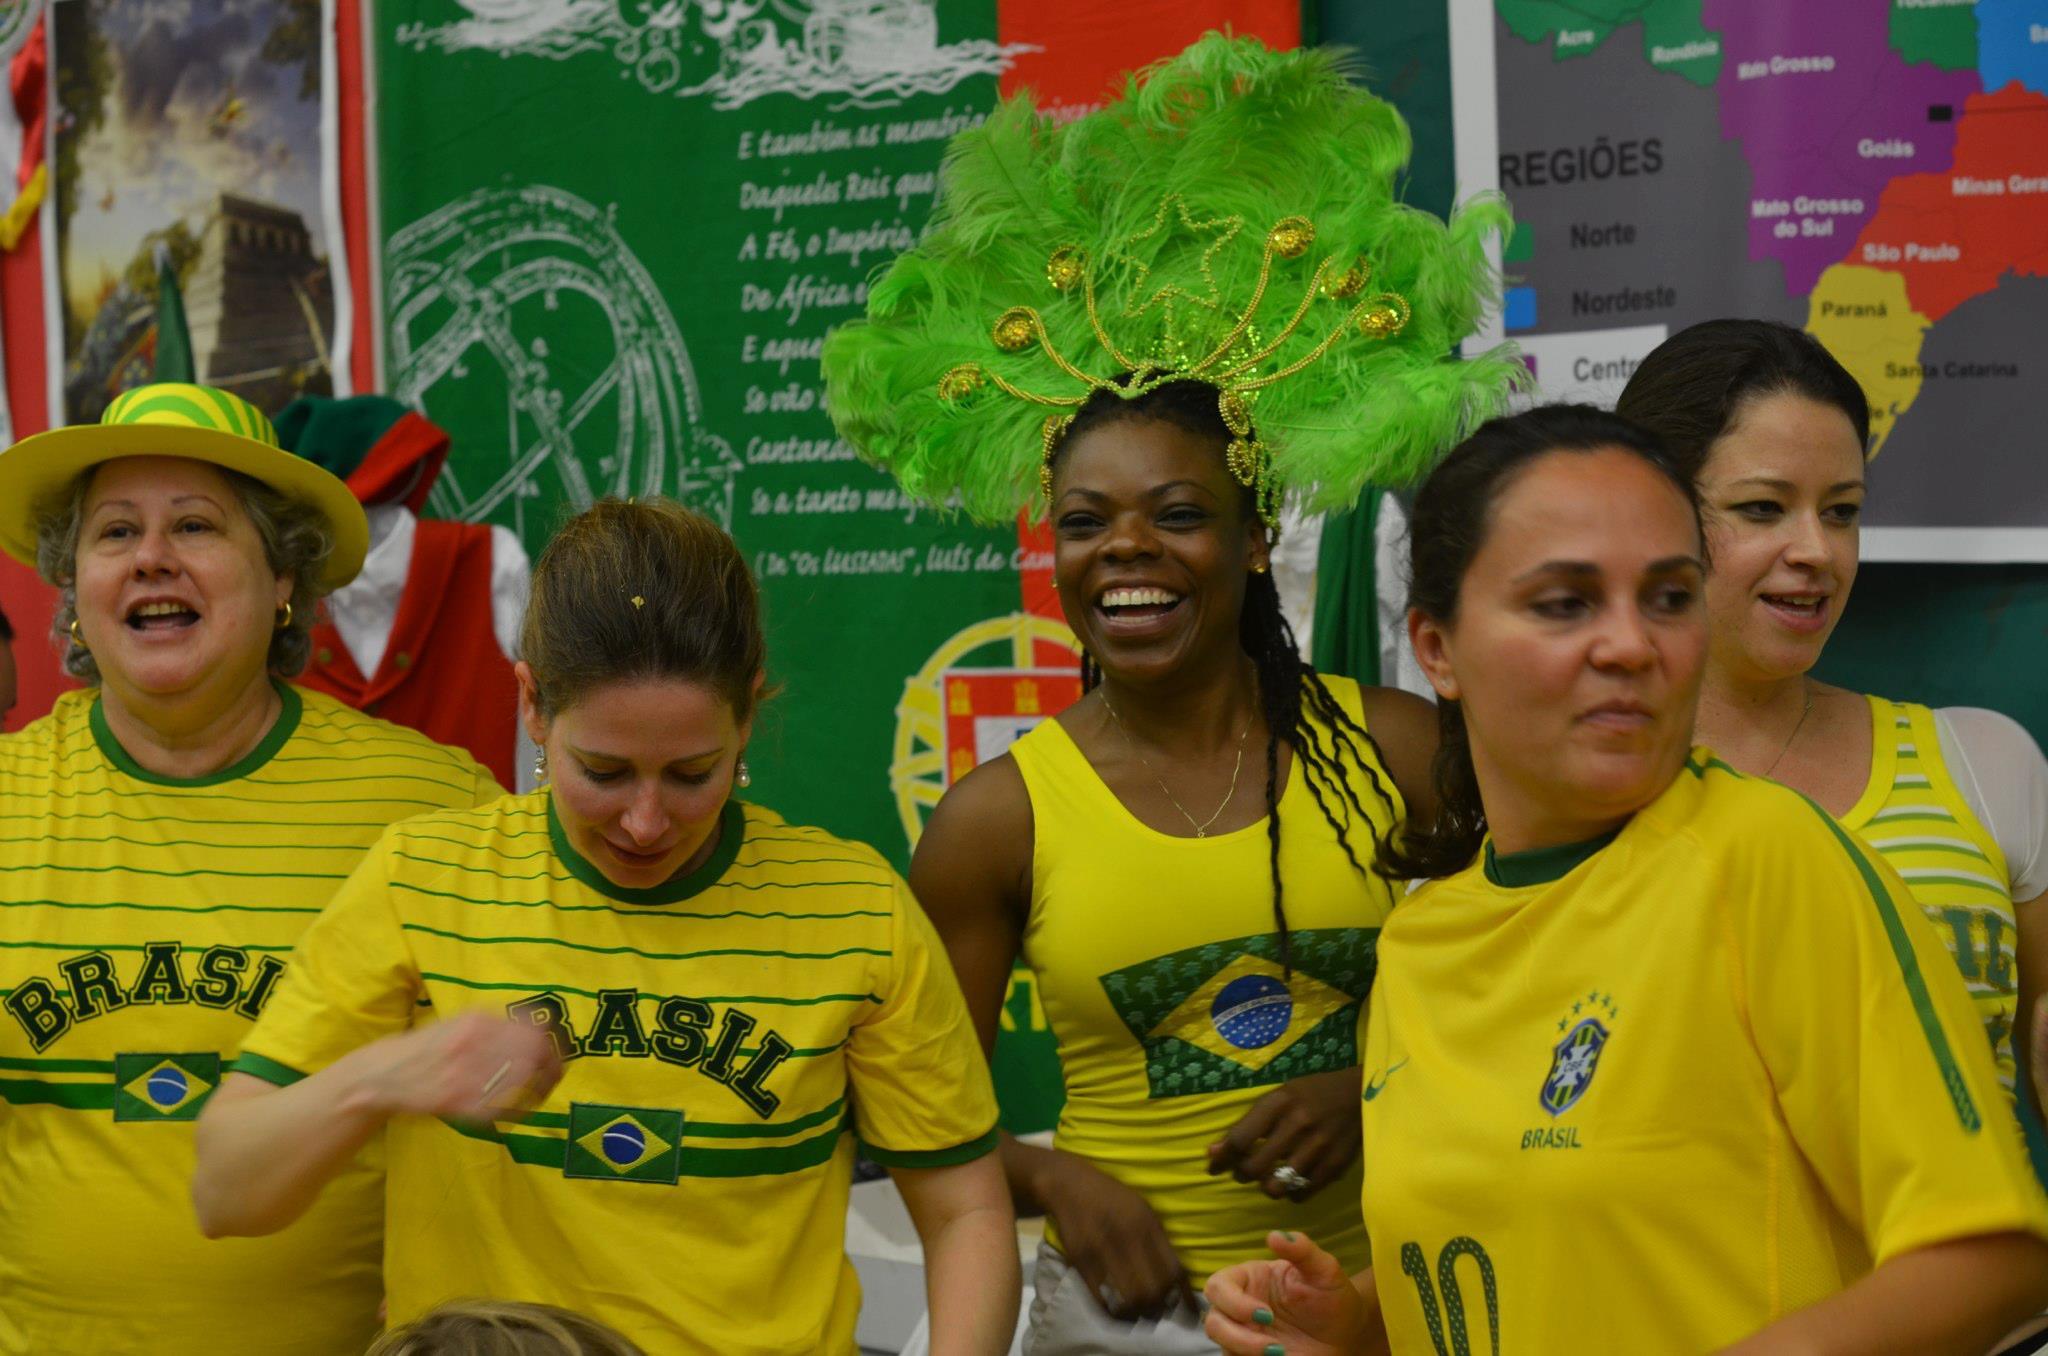 Representing Brazil at the International Festival 2012!